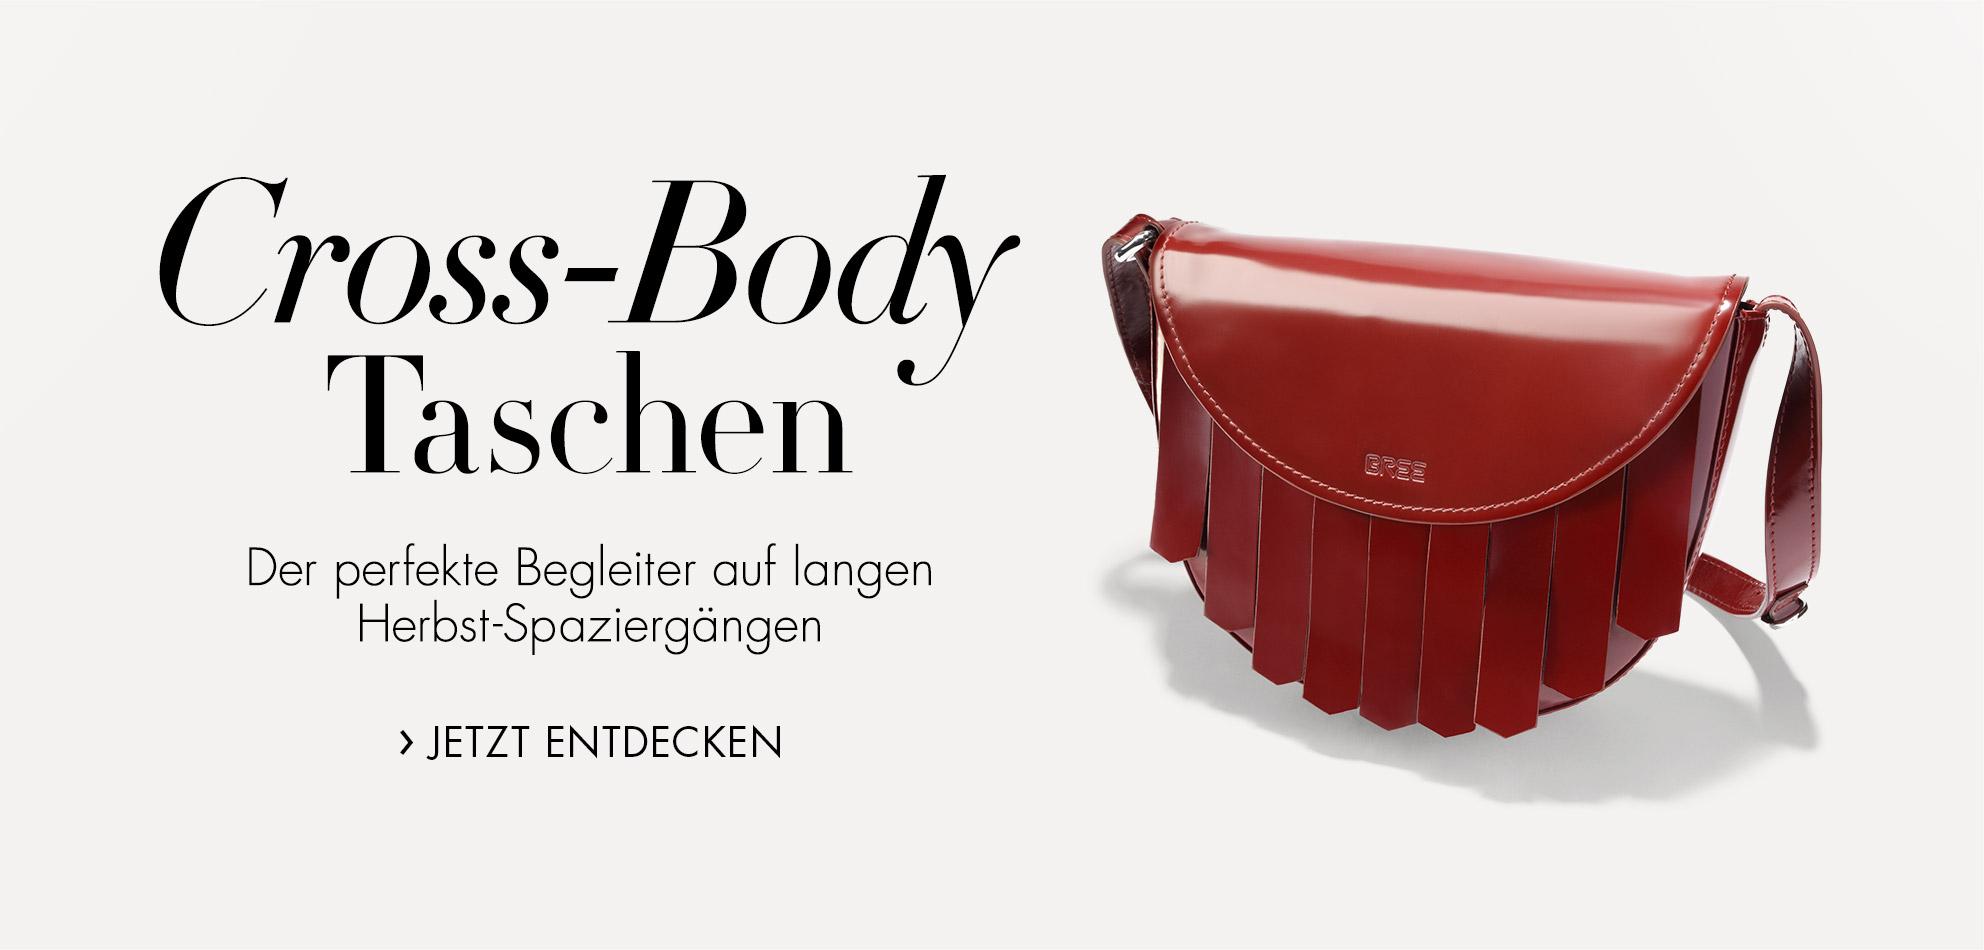 Cross-Body Taschen